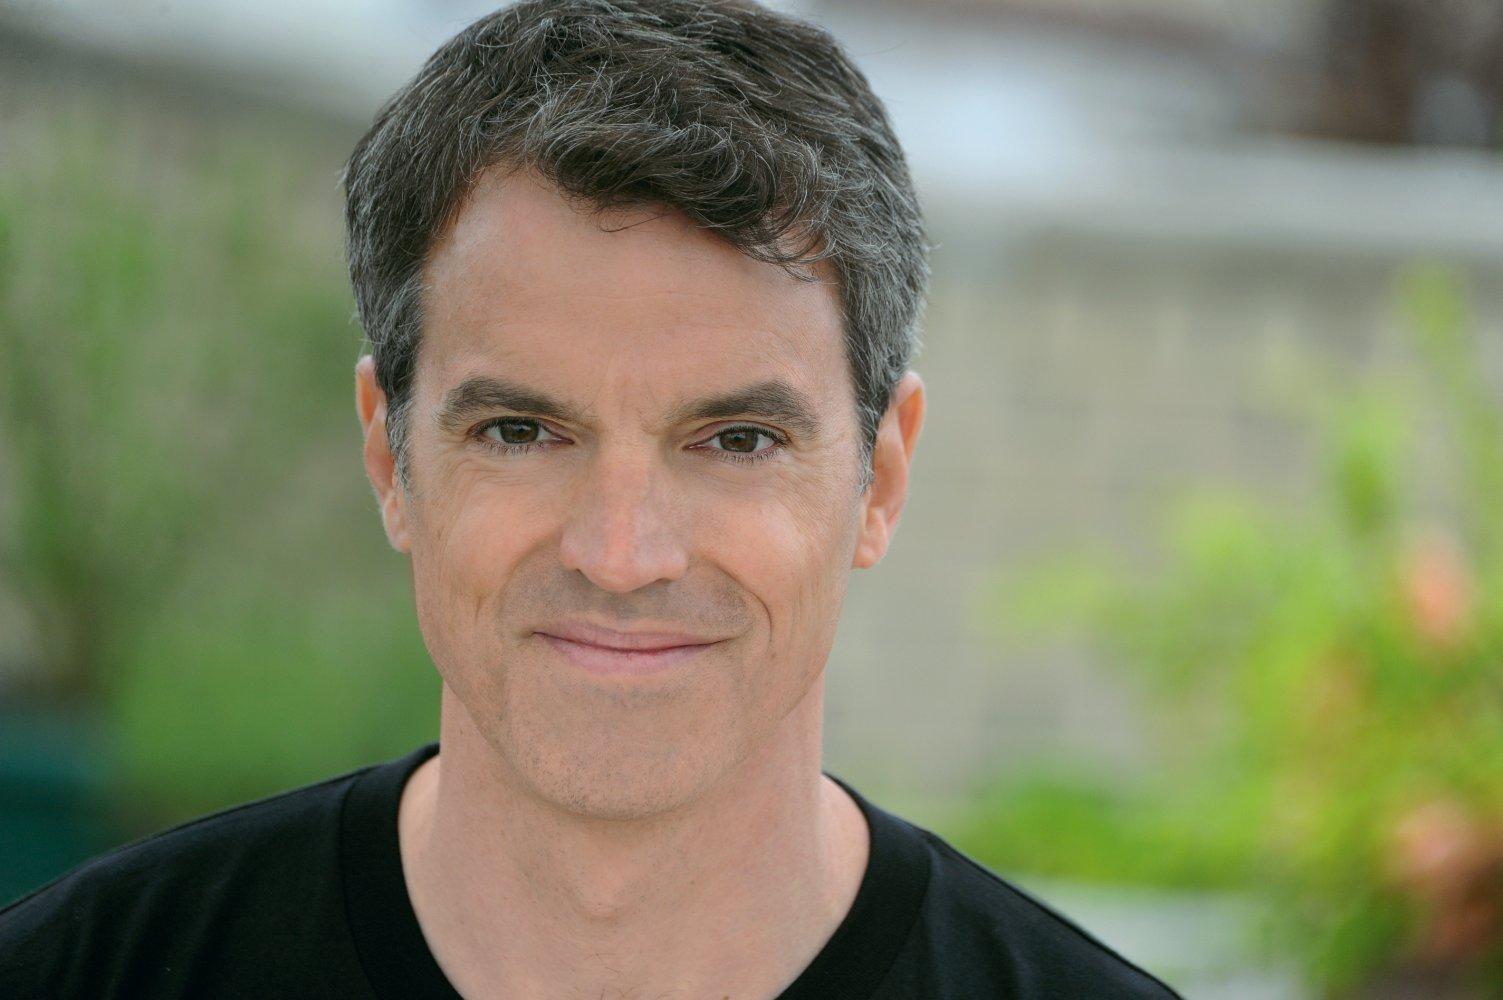 Jeff Auer